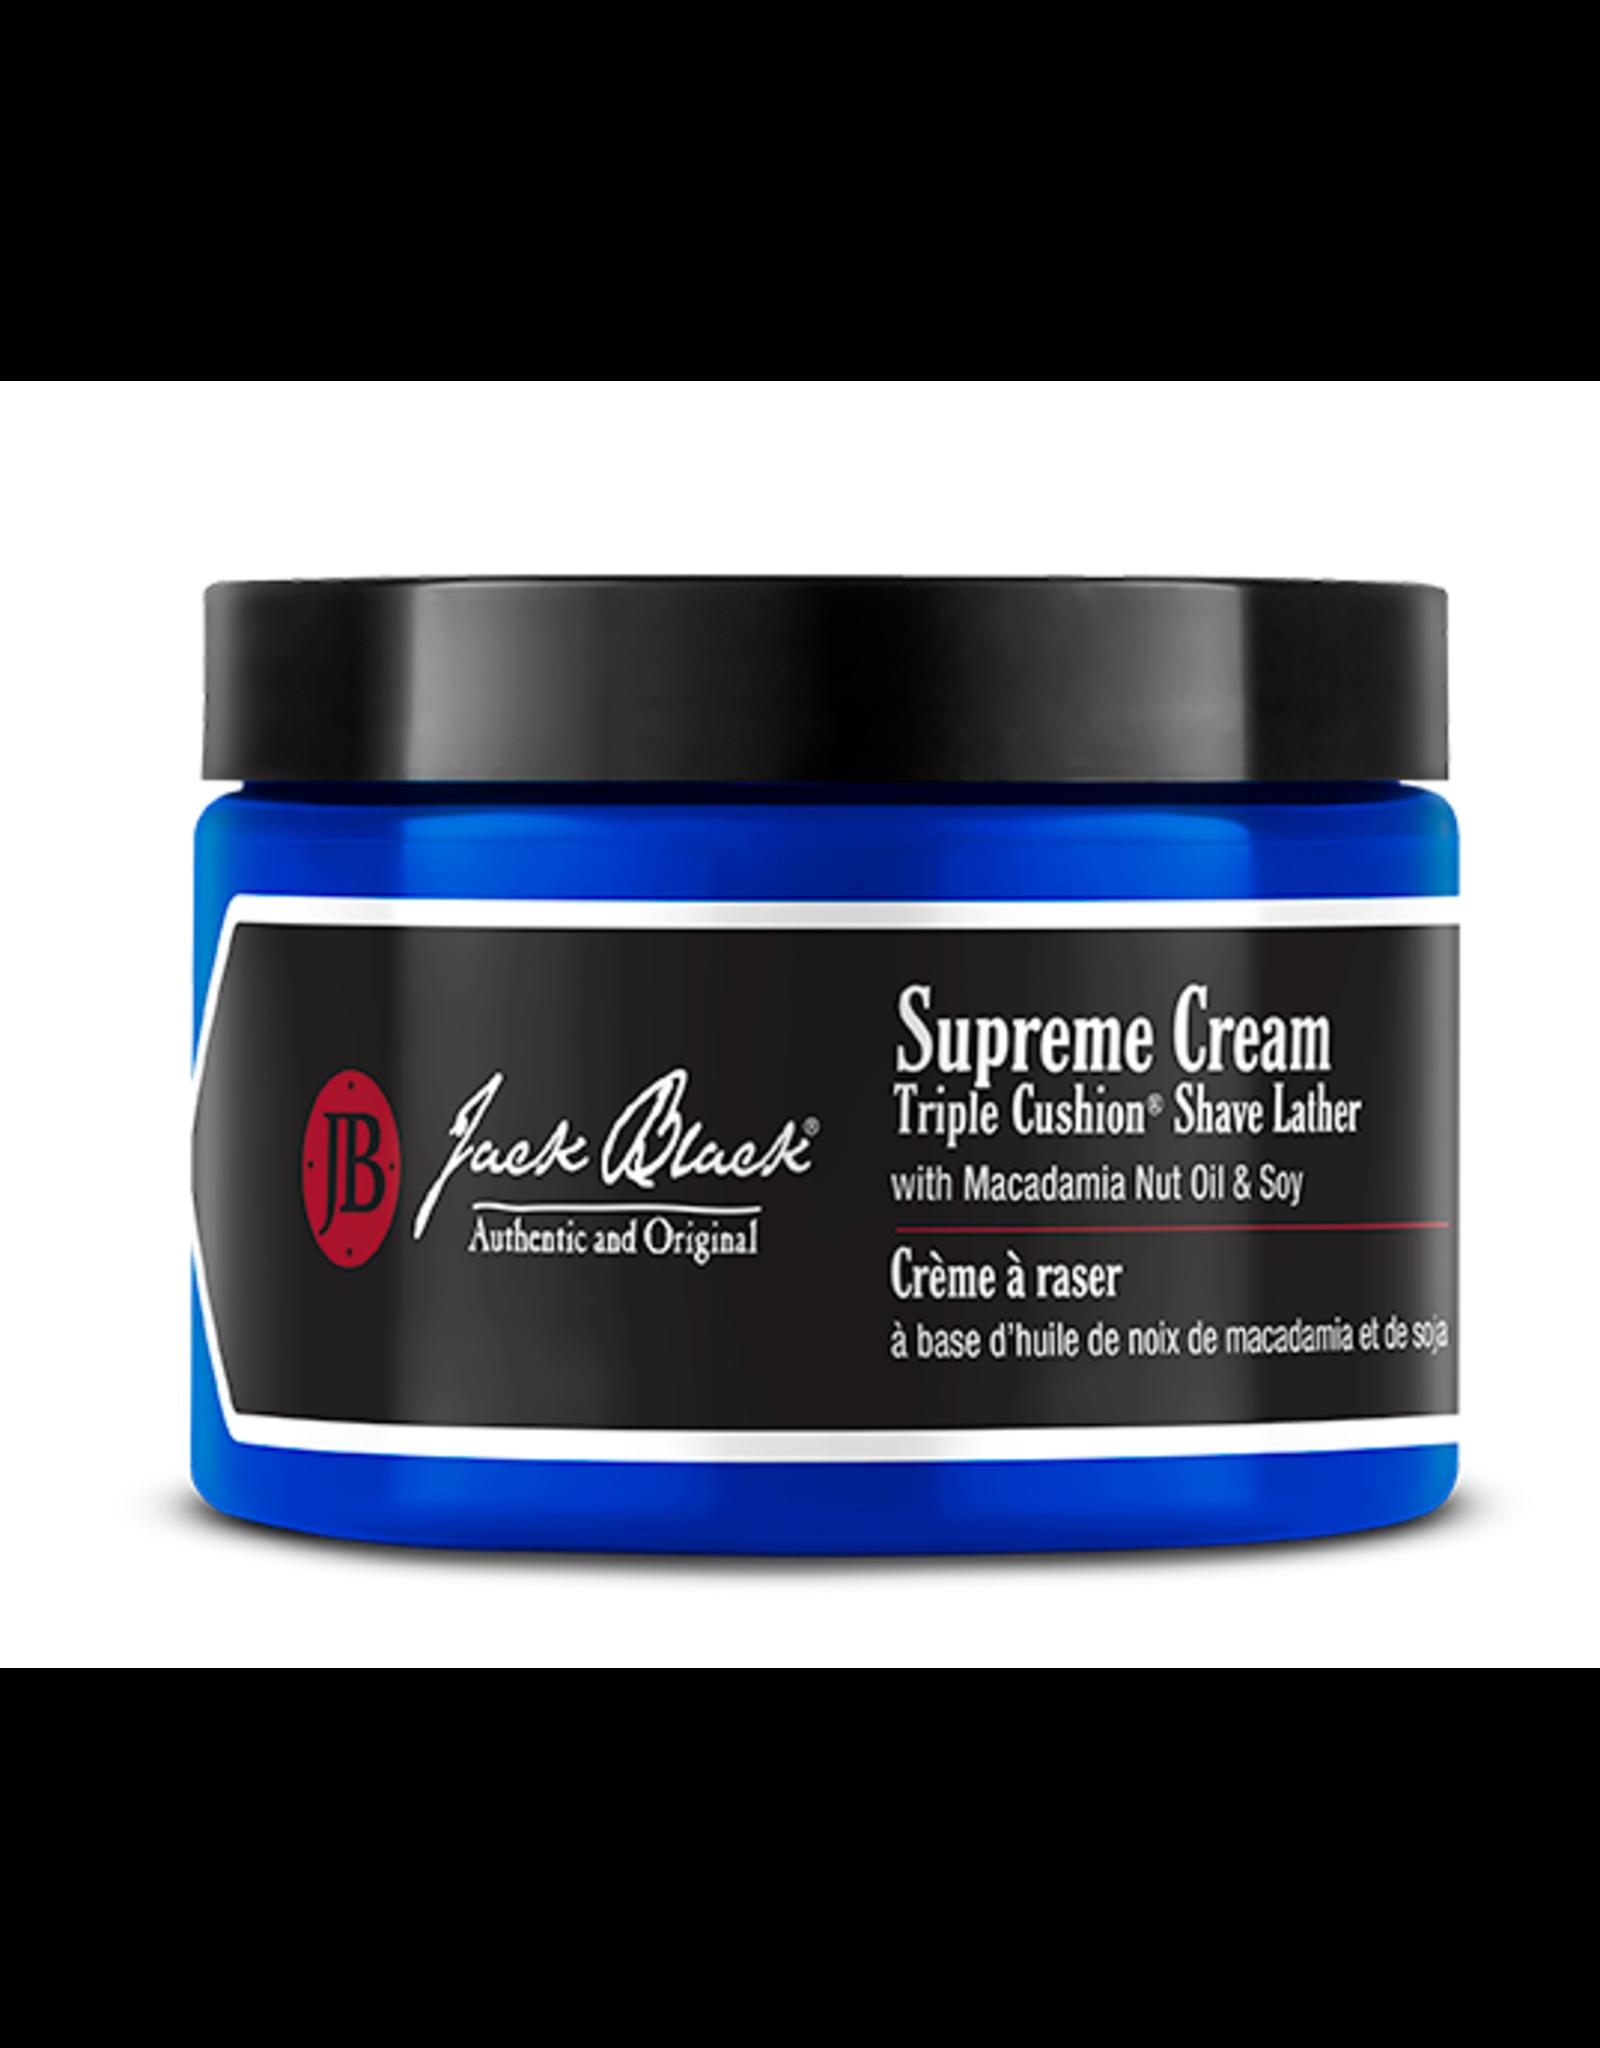 Jack Black Supreme Cream Triple Cushion Shave Lather, 9.5oz by Jack Black